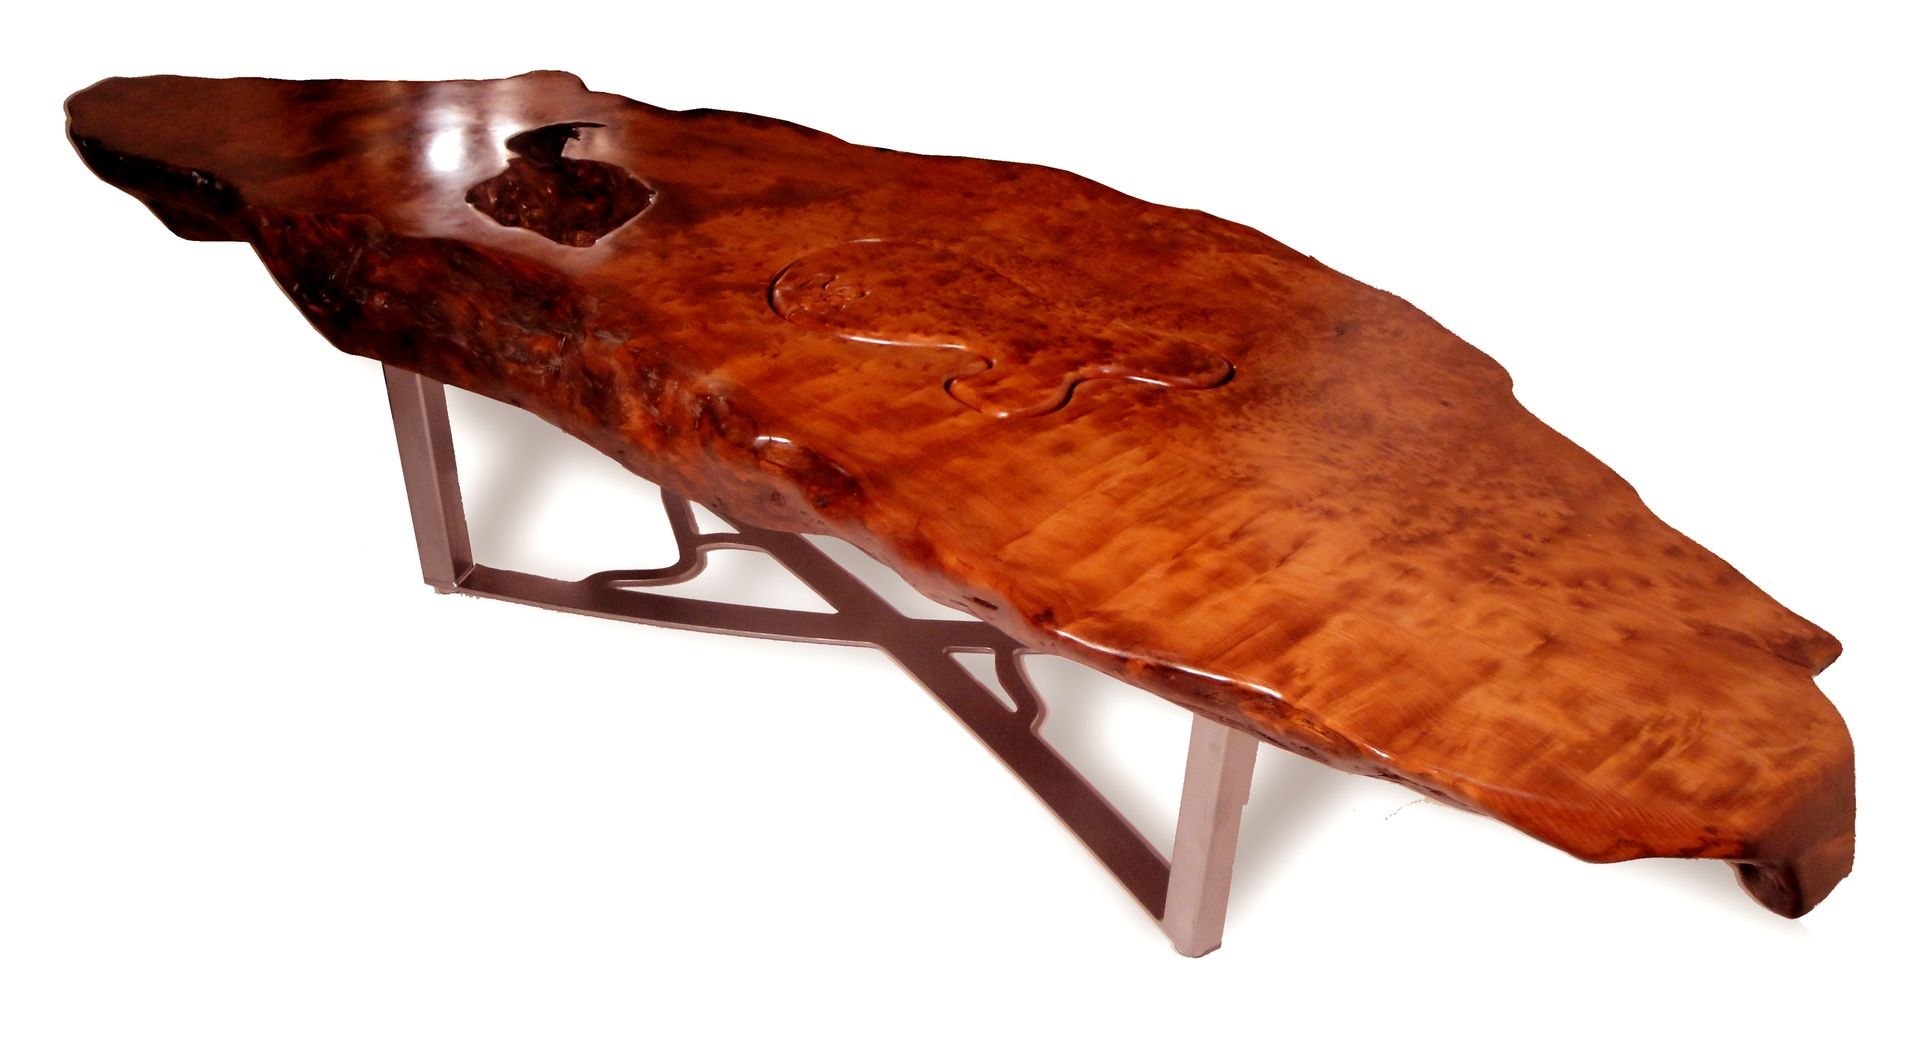 Custom Made Redwood Burl Coffee Table By Scott Dworkin